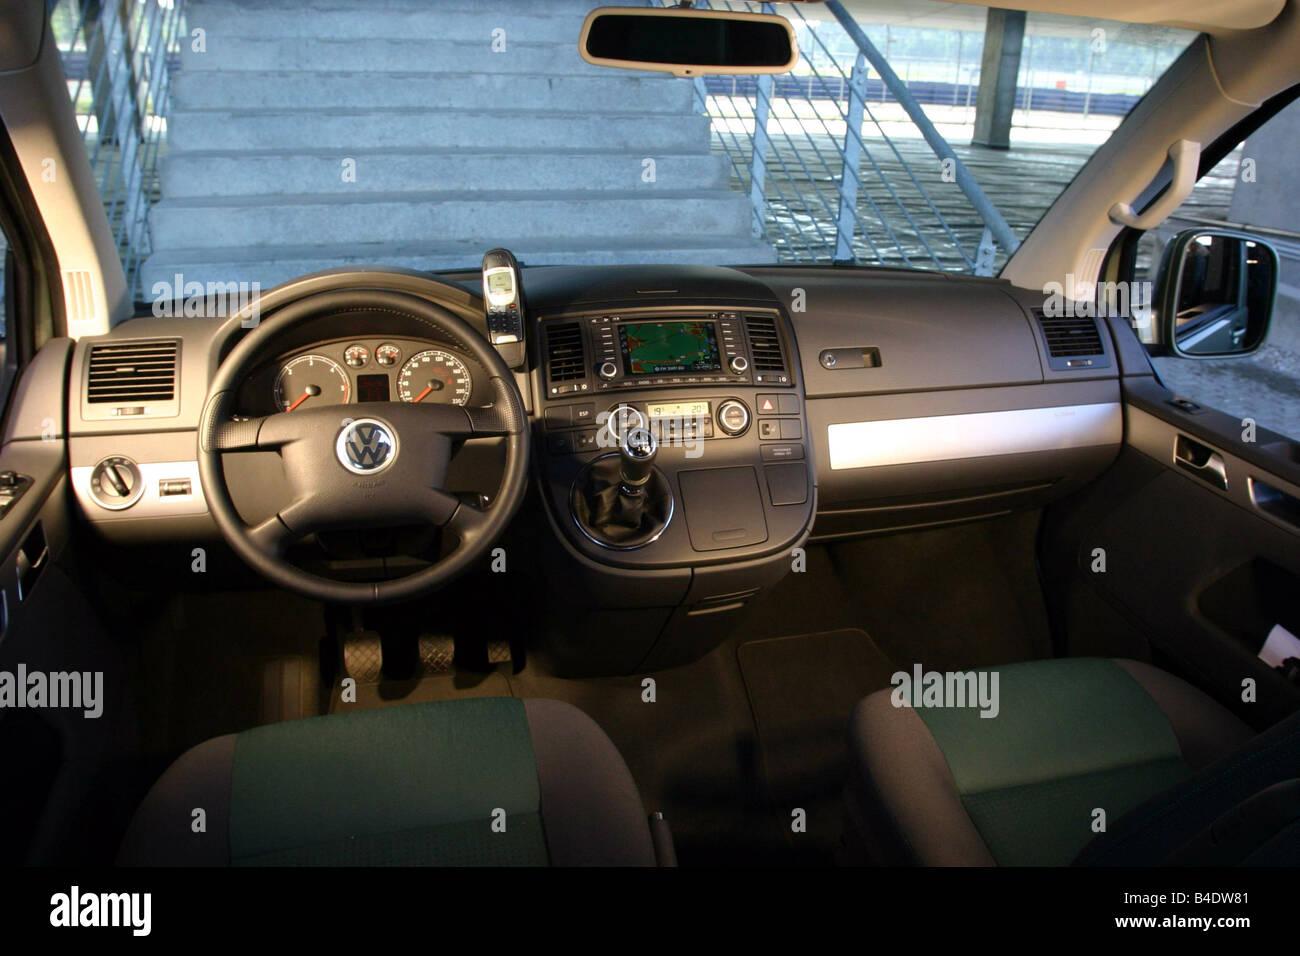 T5 Multivan Stockfotos & T5 Multivan Bilder - Alamy